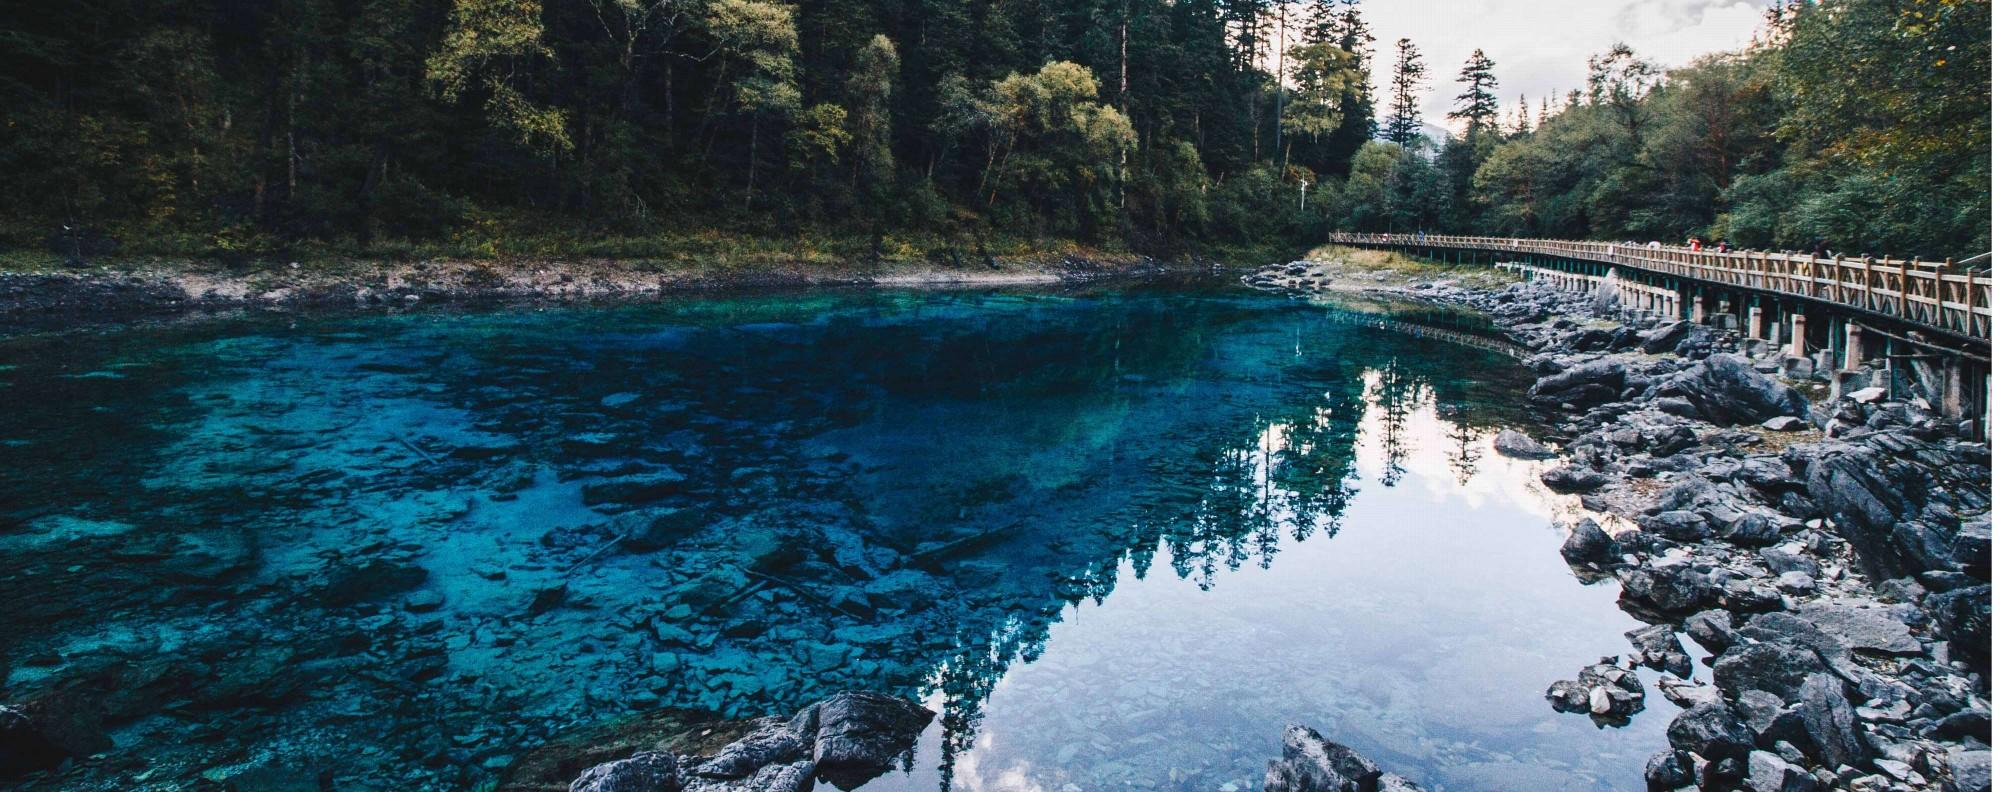 The Five Coloured Pool, in Jiuzhaigou national park, Sichuan province.